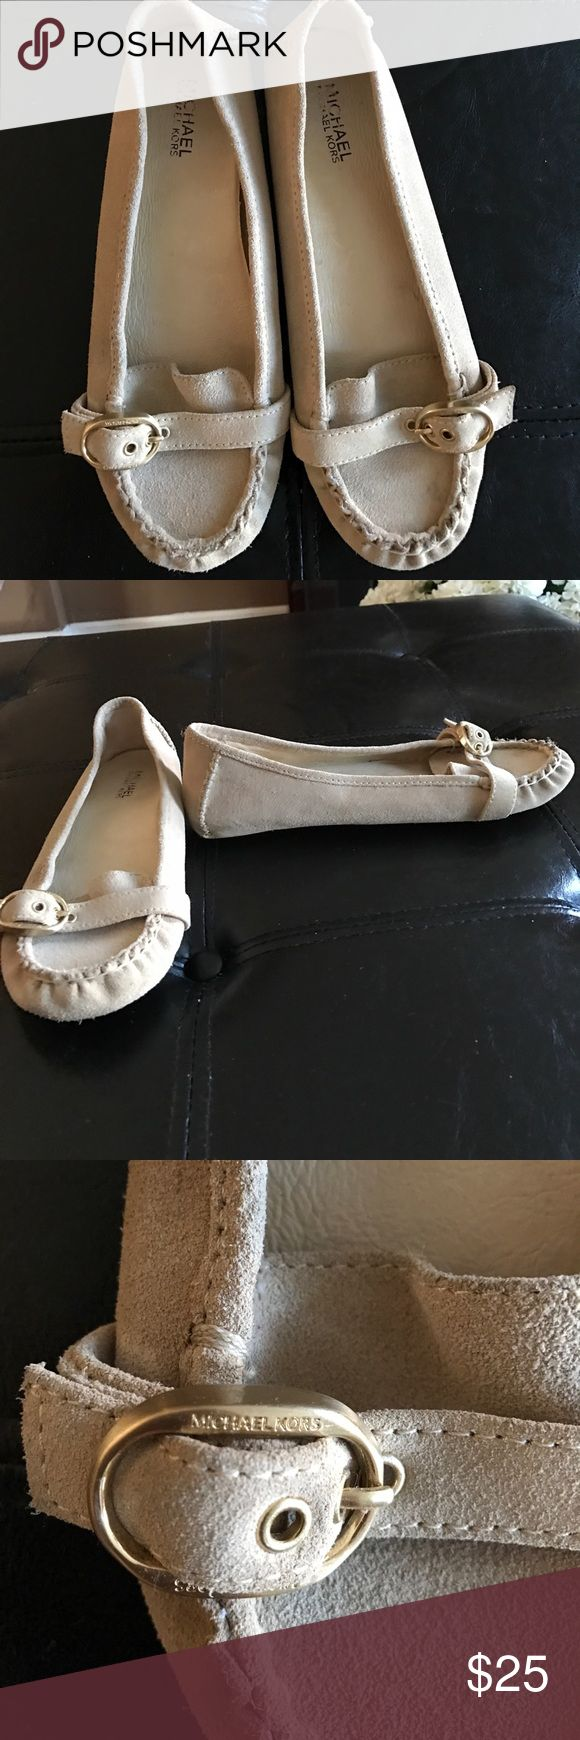 Michael Kors suede flats Fabulous pair of Michael Kors flats Michael Kors Shoes Flats & Loafers